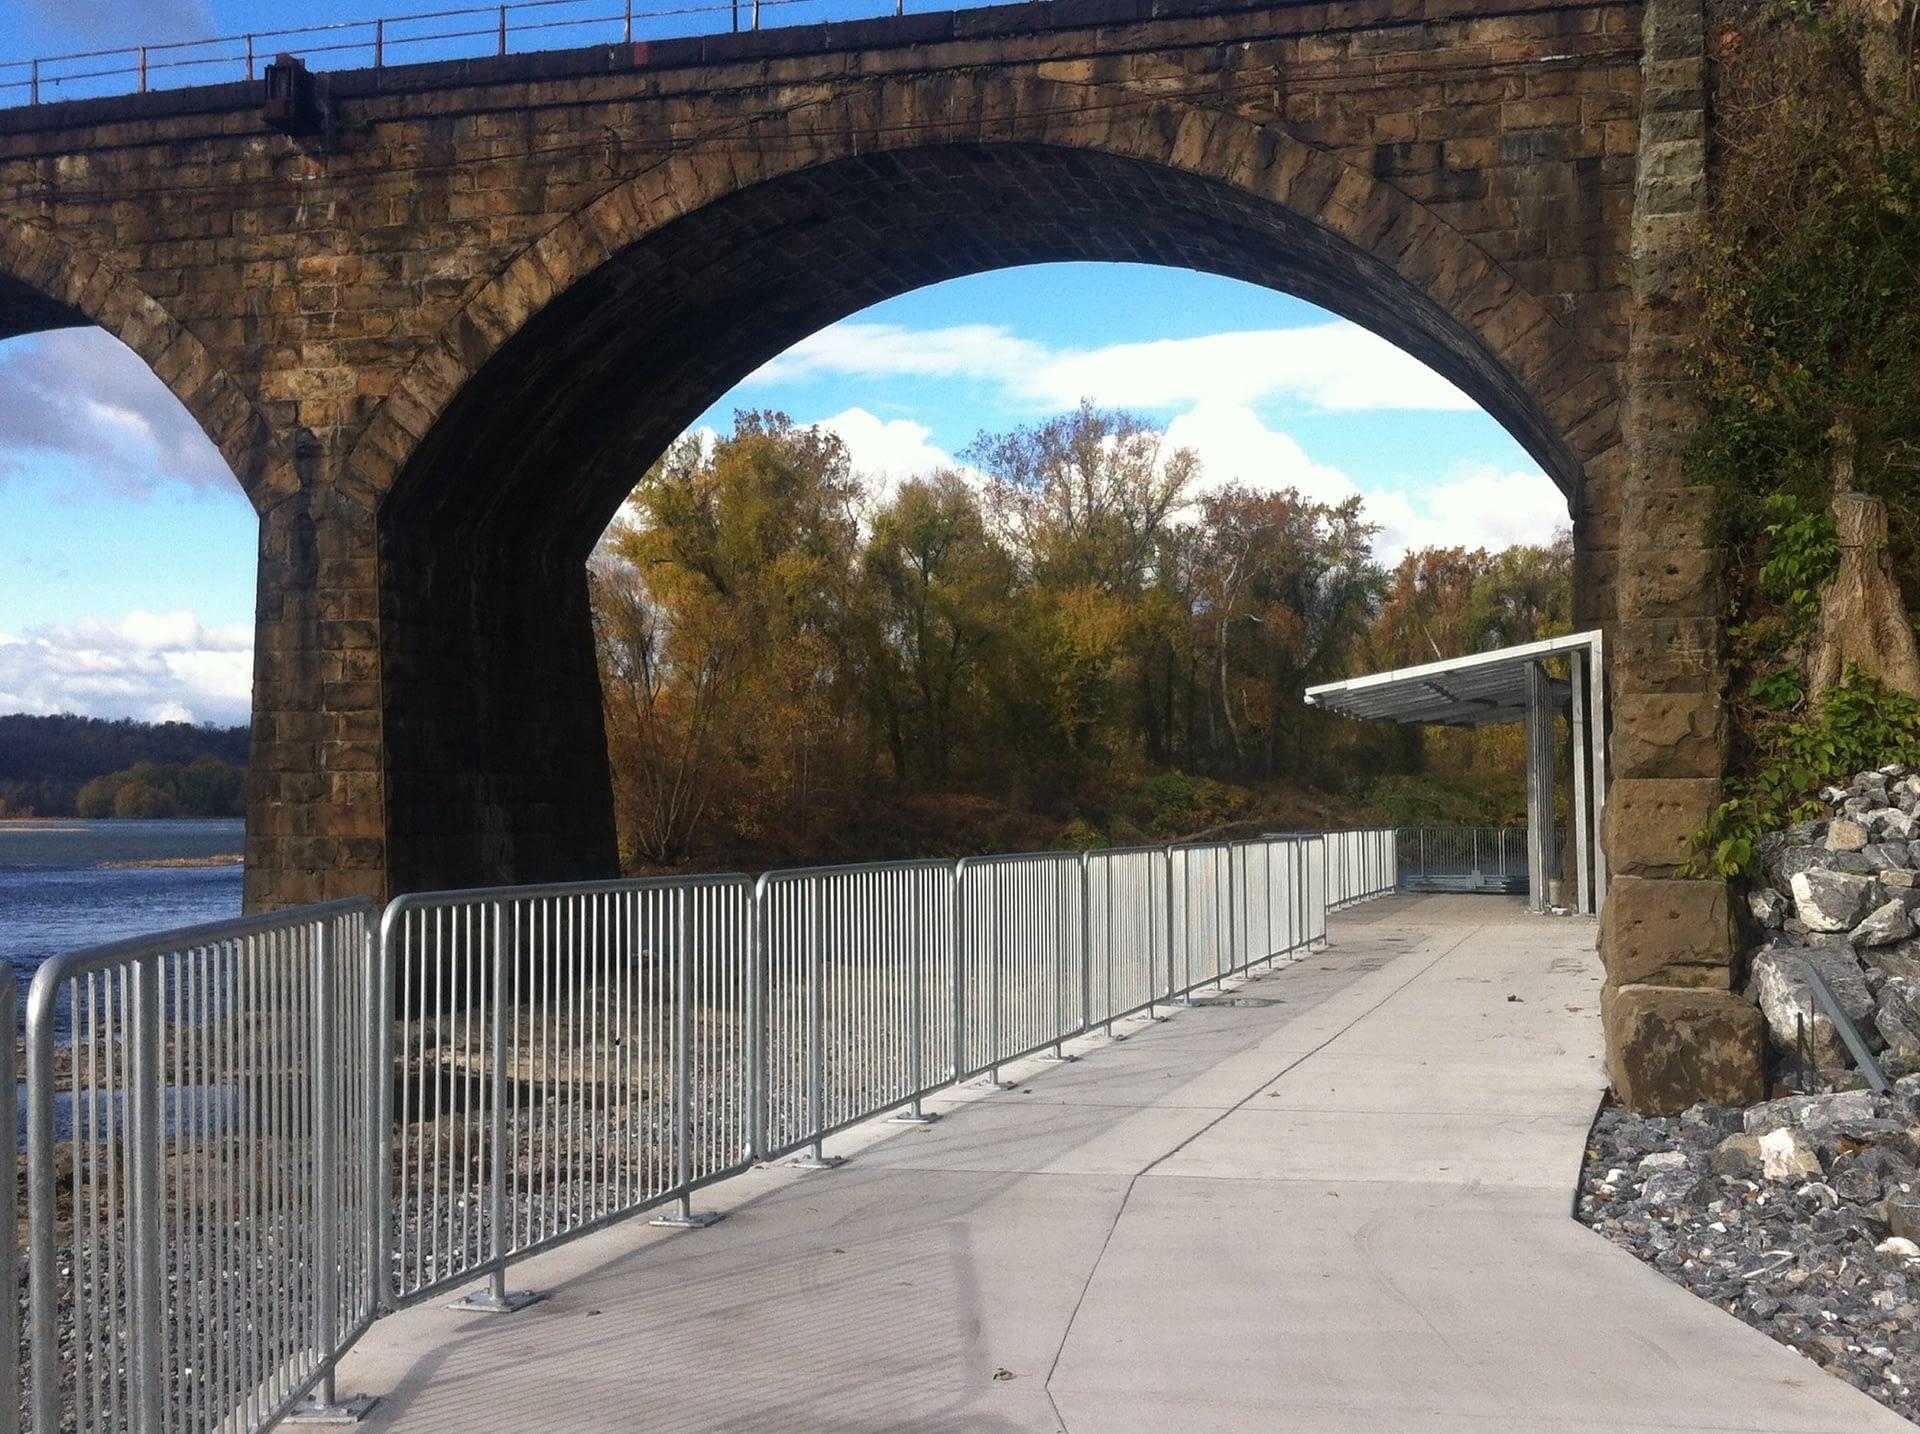 Shocks Mill Bridge 2